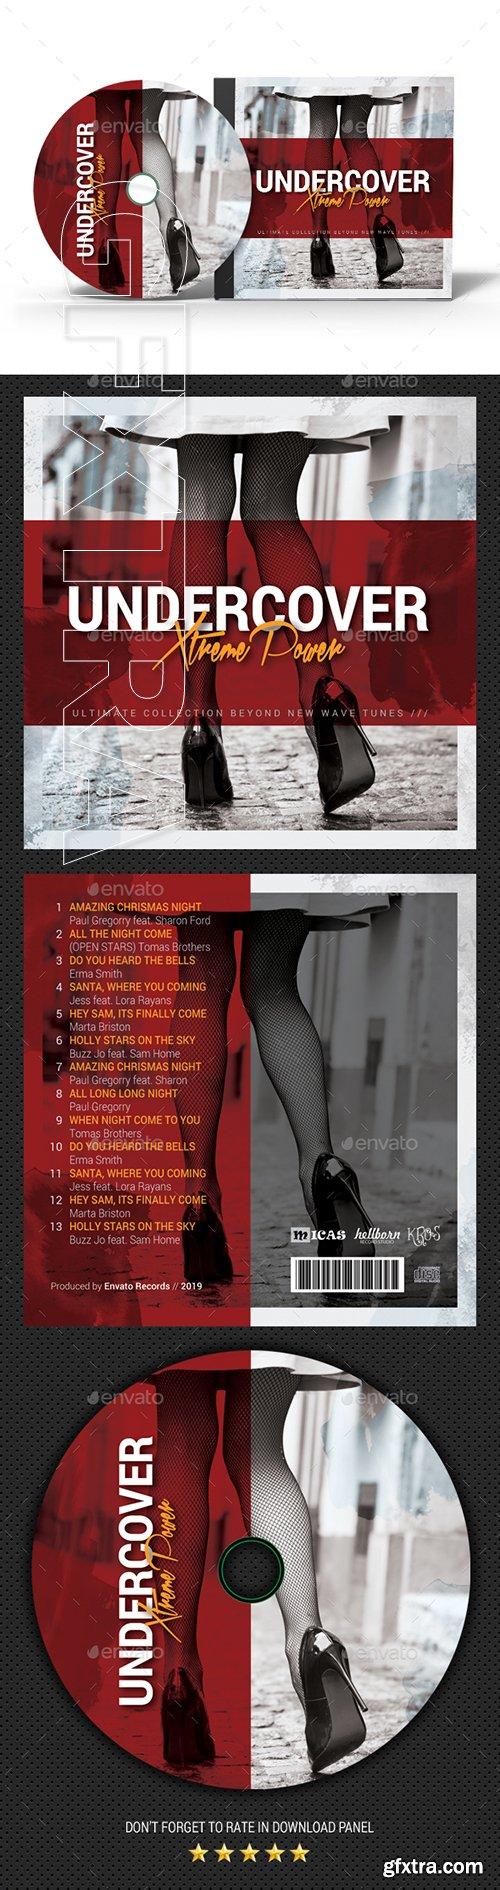 GraphicRiver - Undercover CD Cover Vol2 22530679